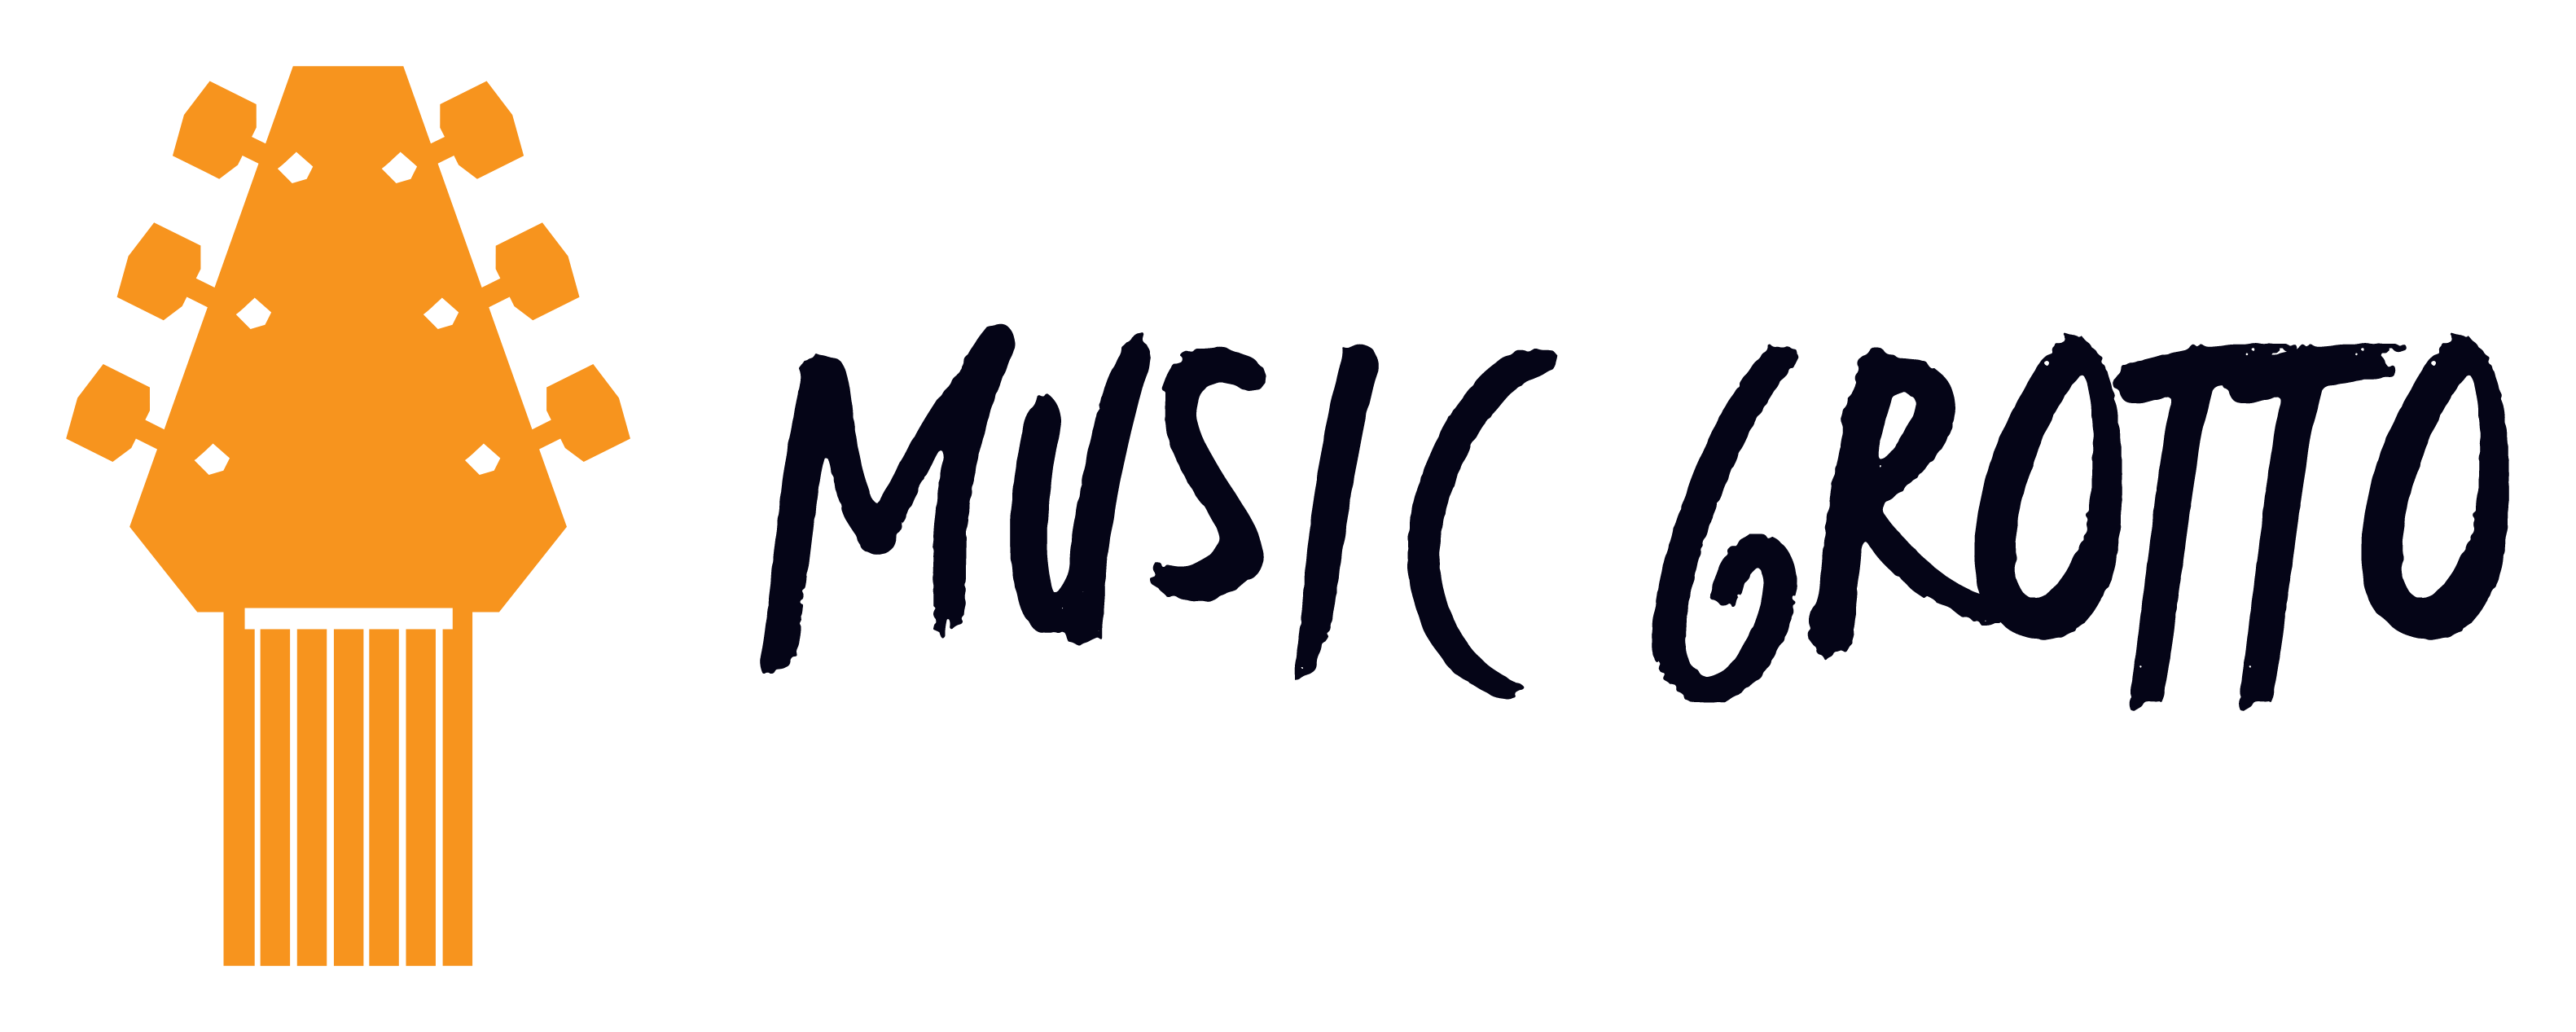 Music Grotto